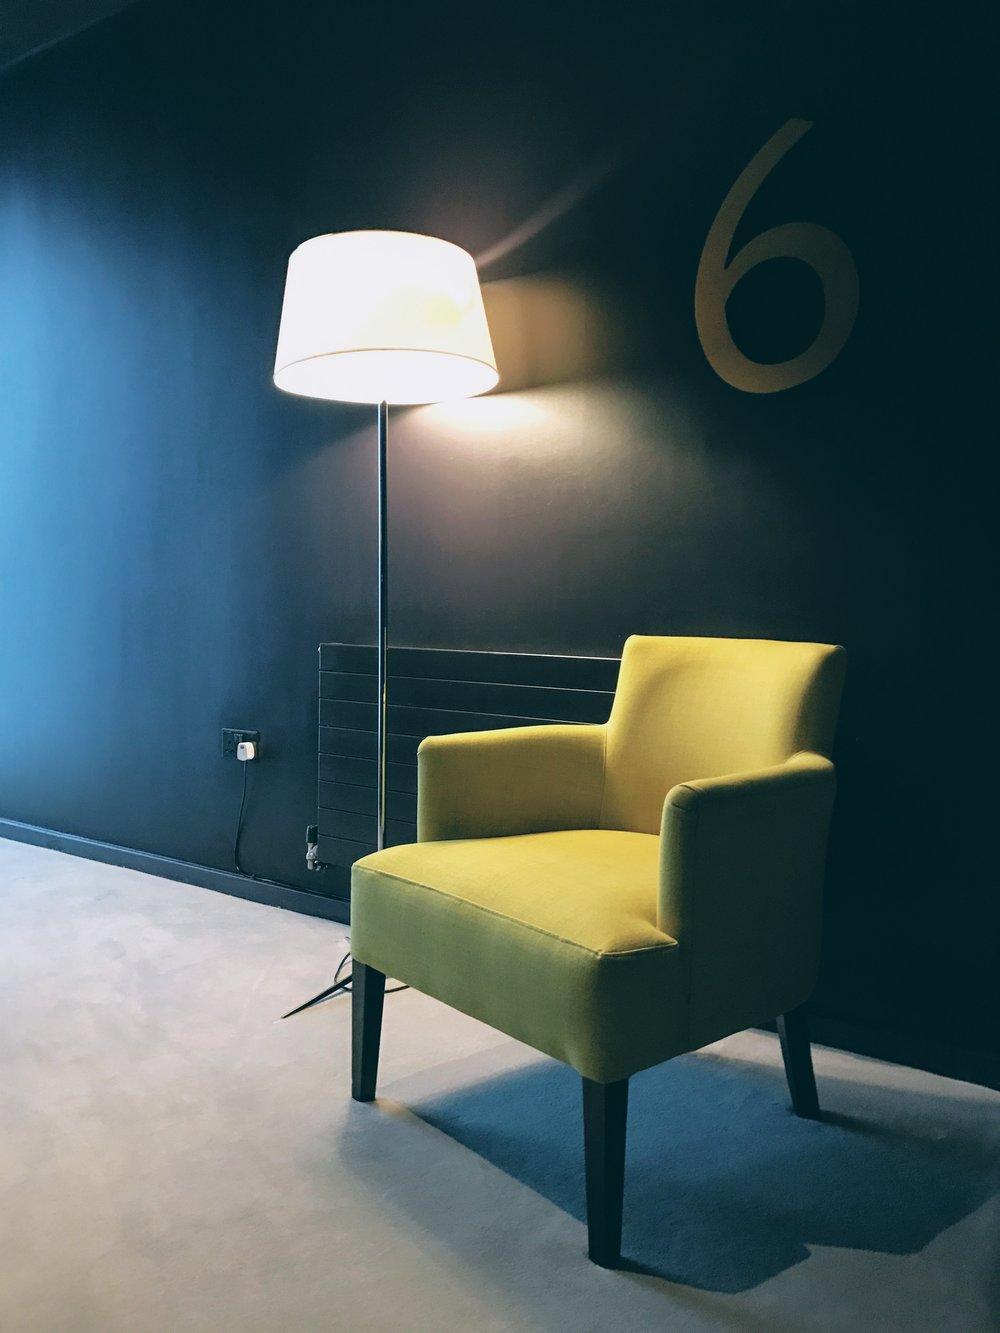 TheMarkerhotel2CDublin-1.jpg